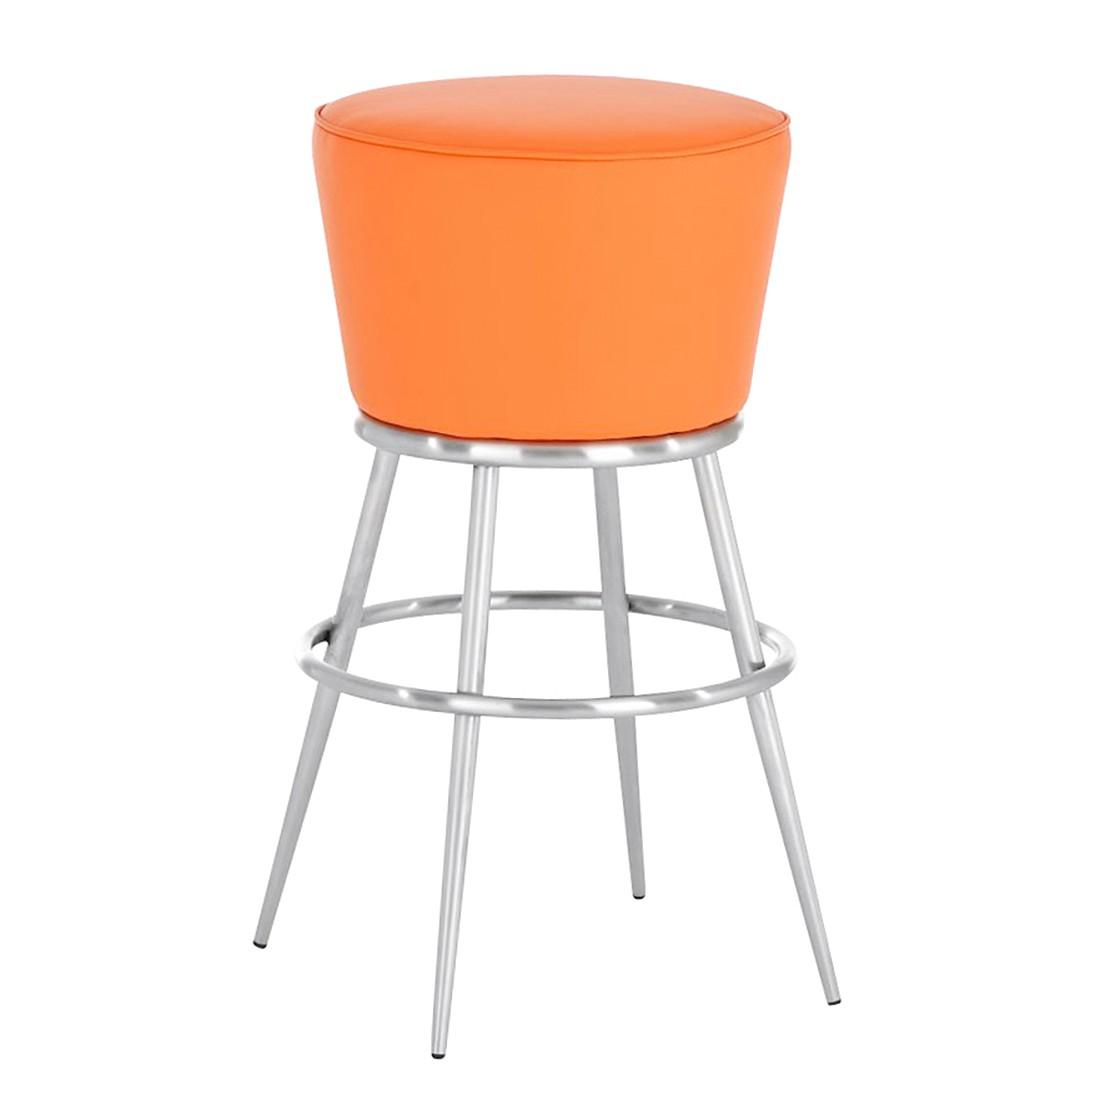 Barhocker Laos E85 – Orange -Edelstahl/Kunstleder, CLP günstig kaufen